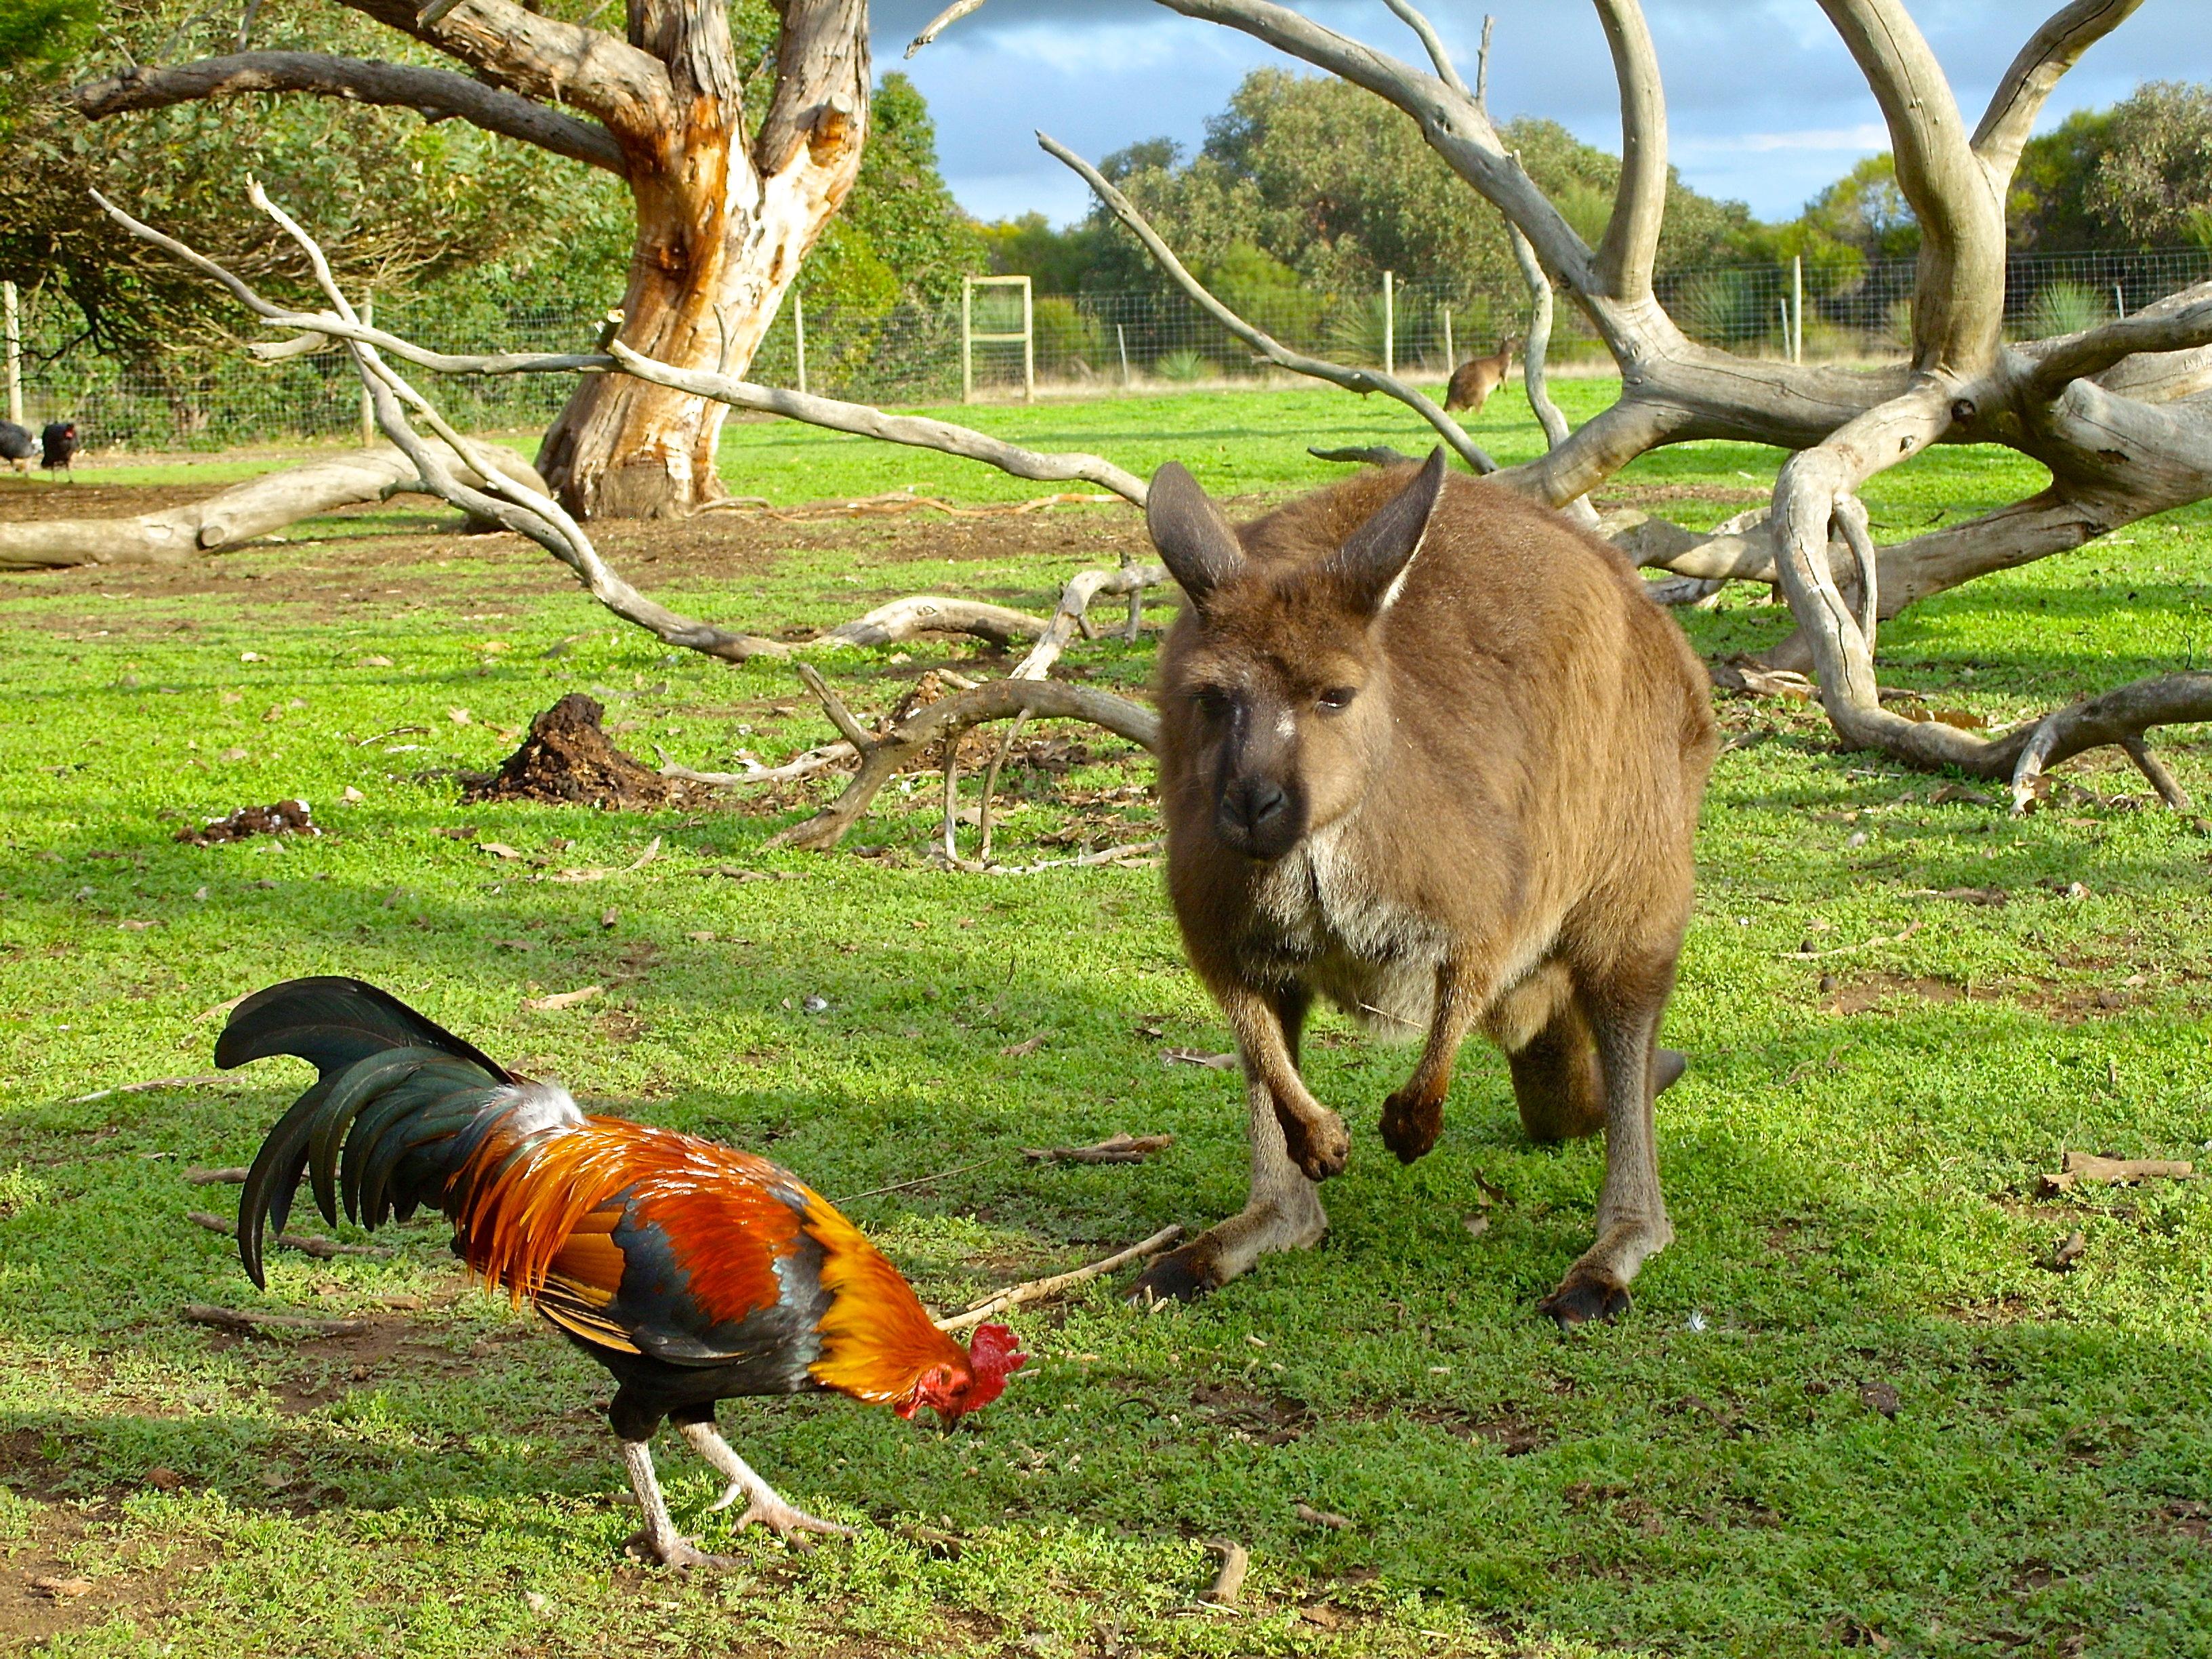 Kangaroo and rooster on Kangaroo Island Australia